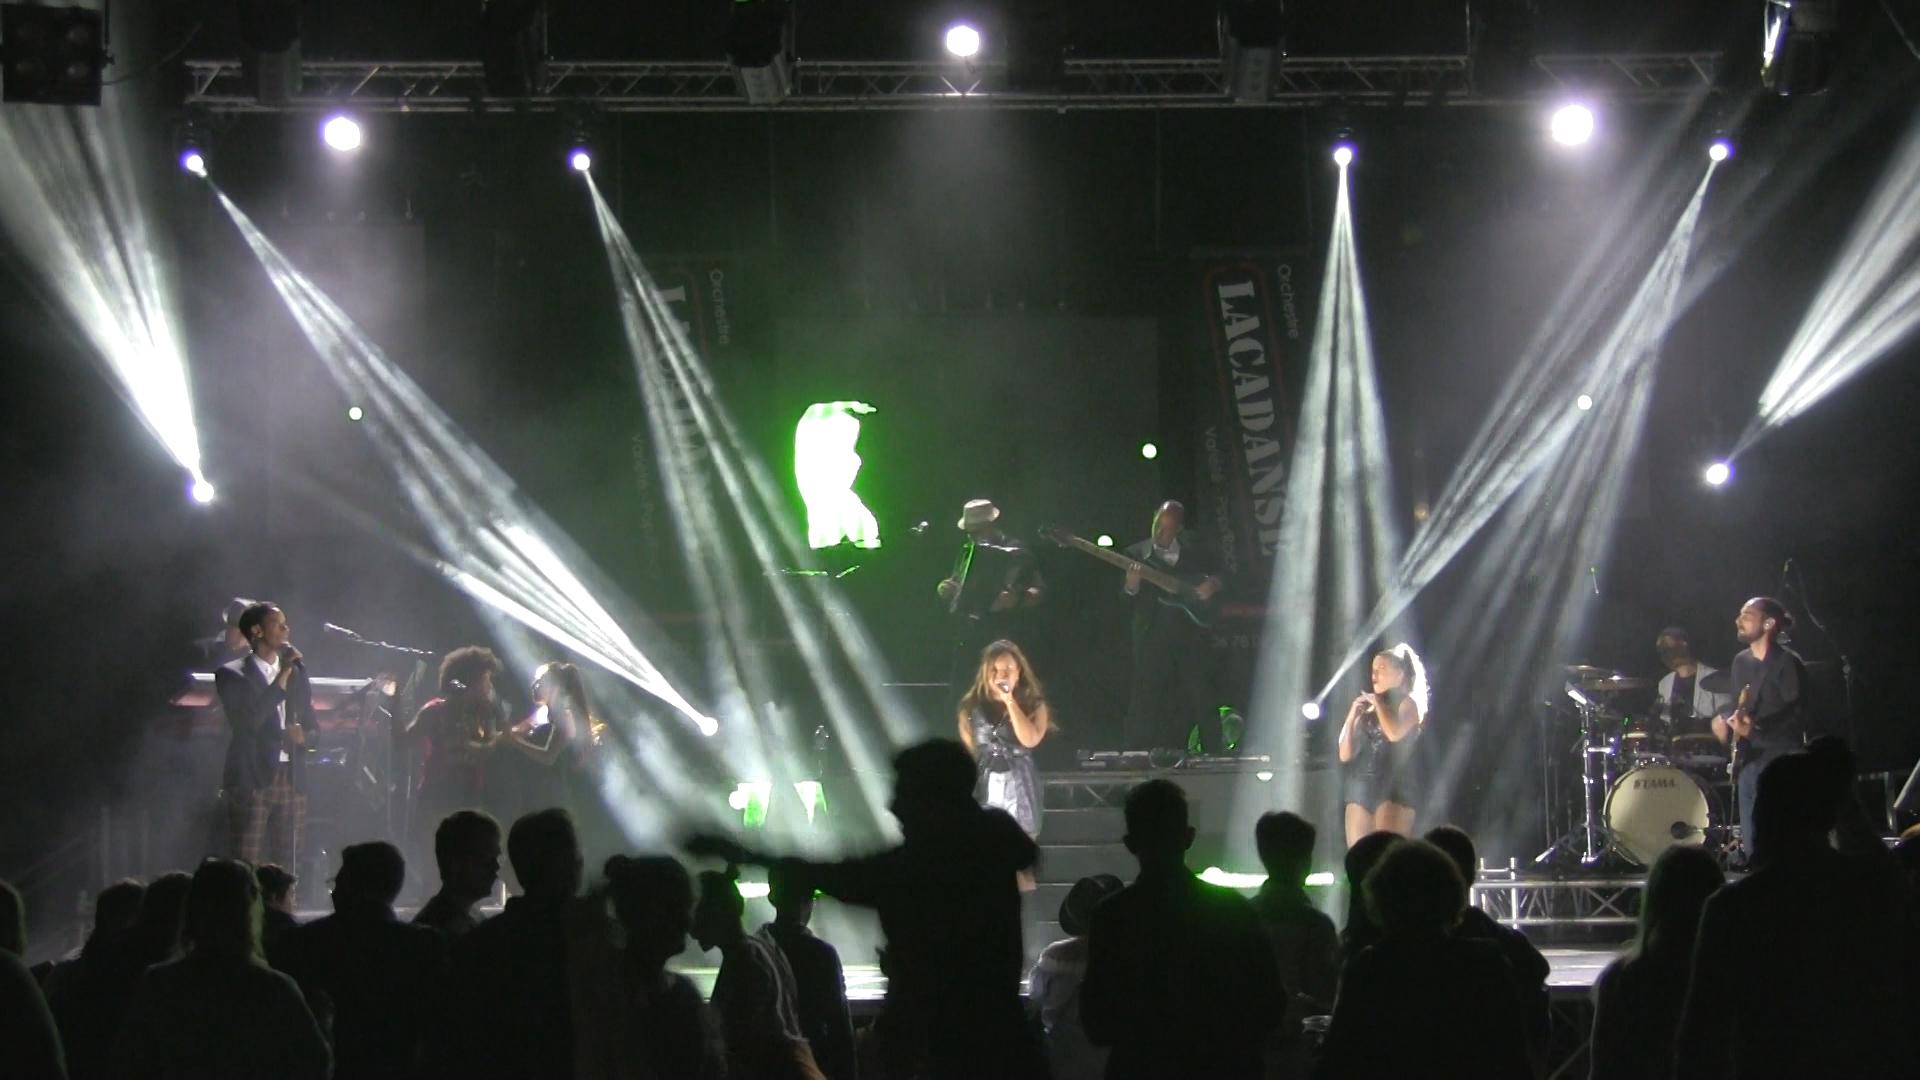 Orchestre festif 2019 Lacadanse